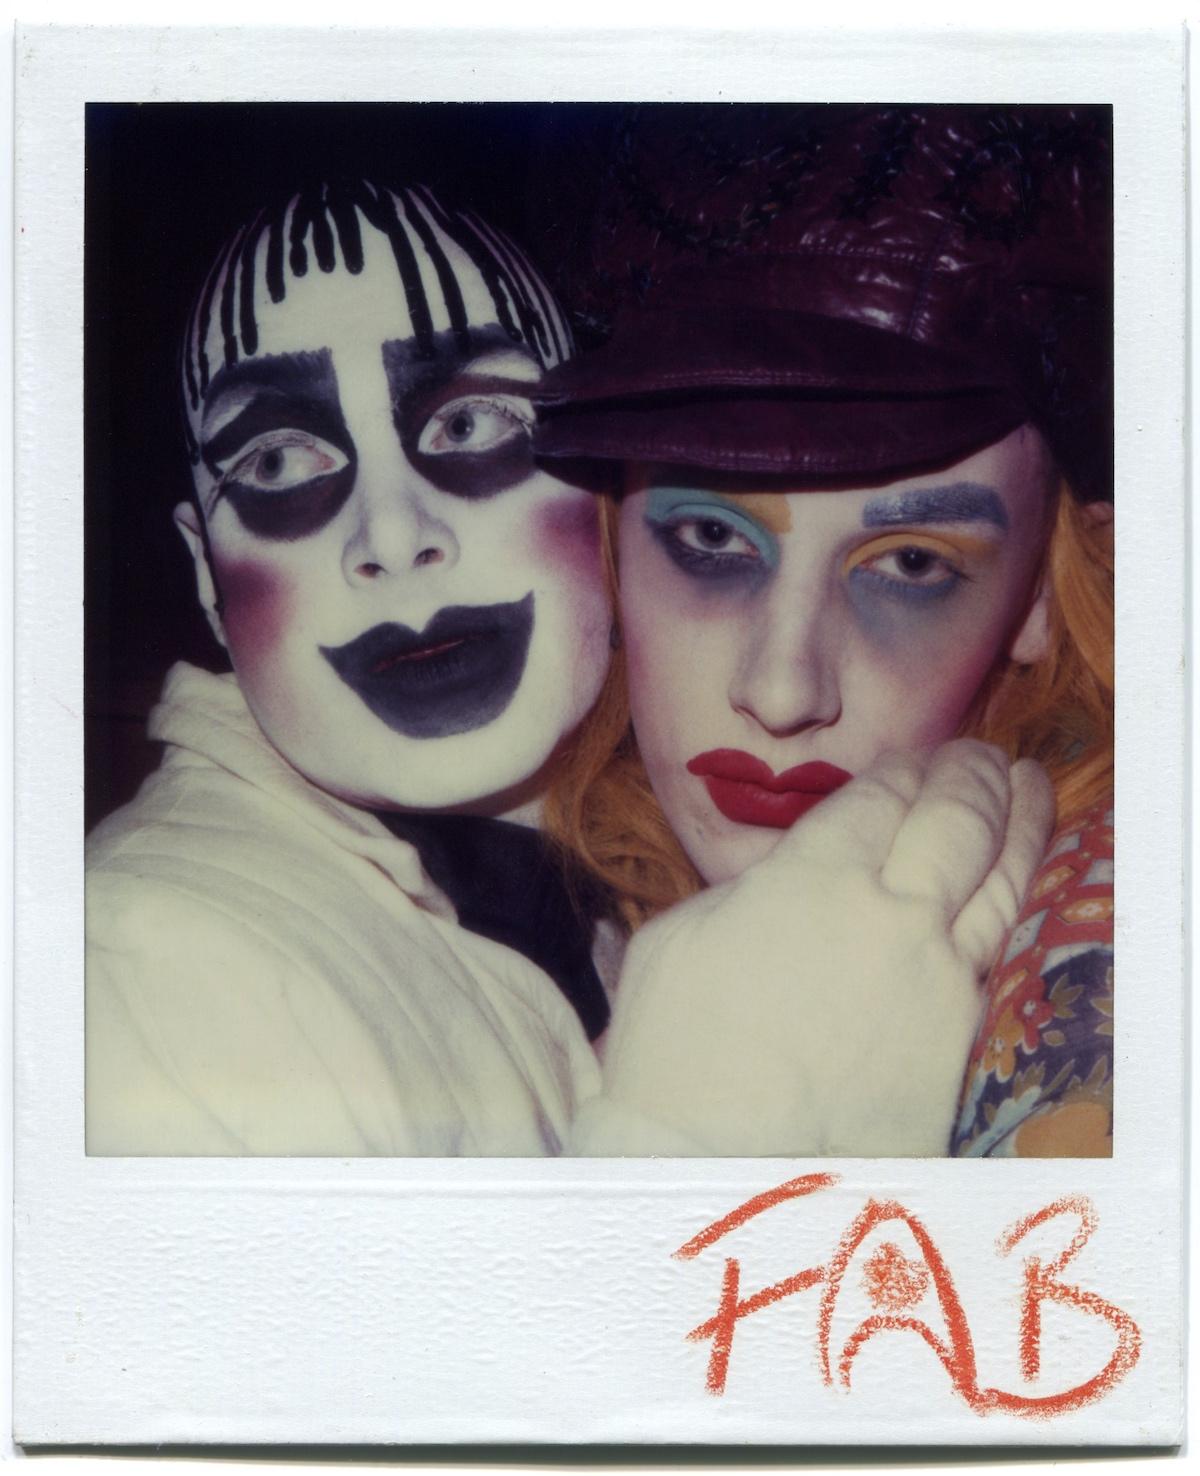 POLAROID ARCHIVE - ©  Peter Paul Hartnett, view Polaroid Collection  HERE